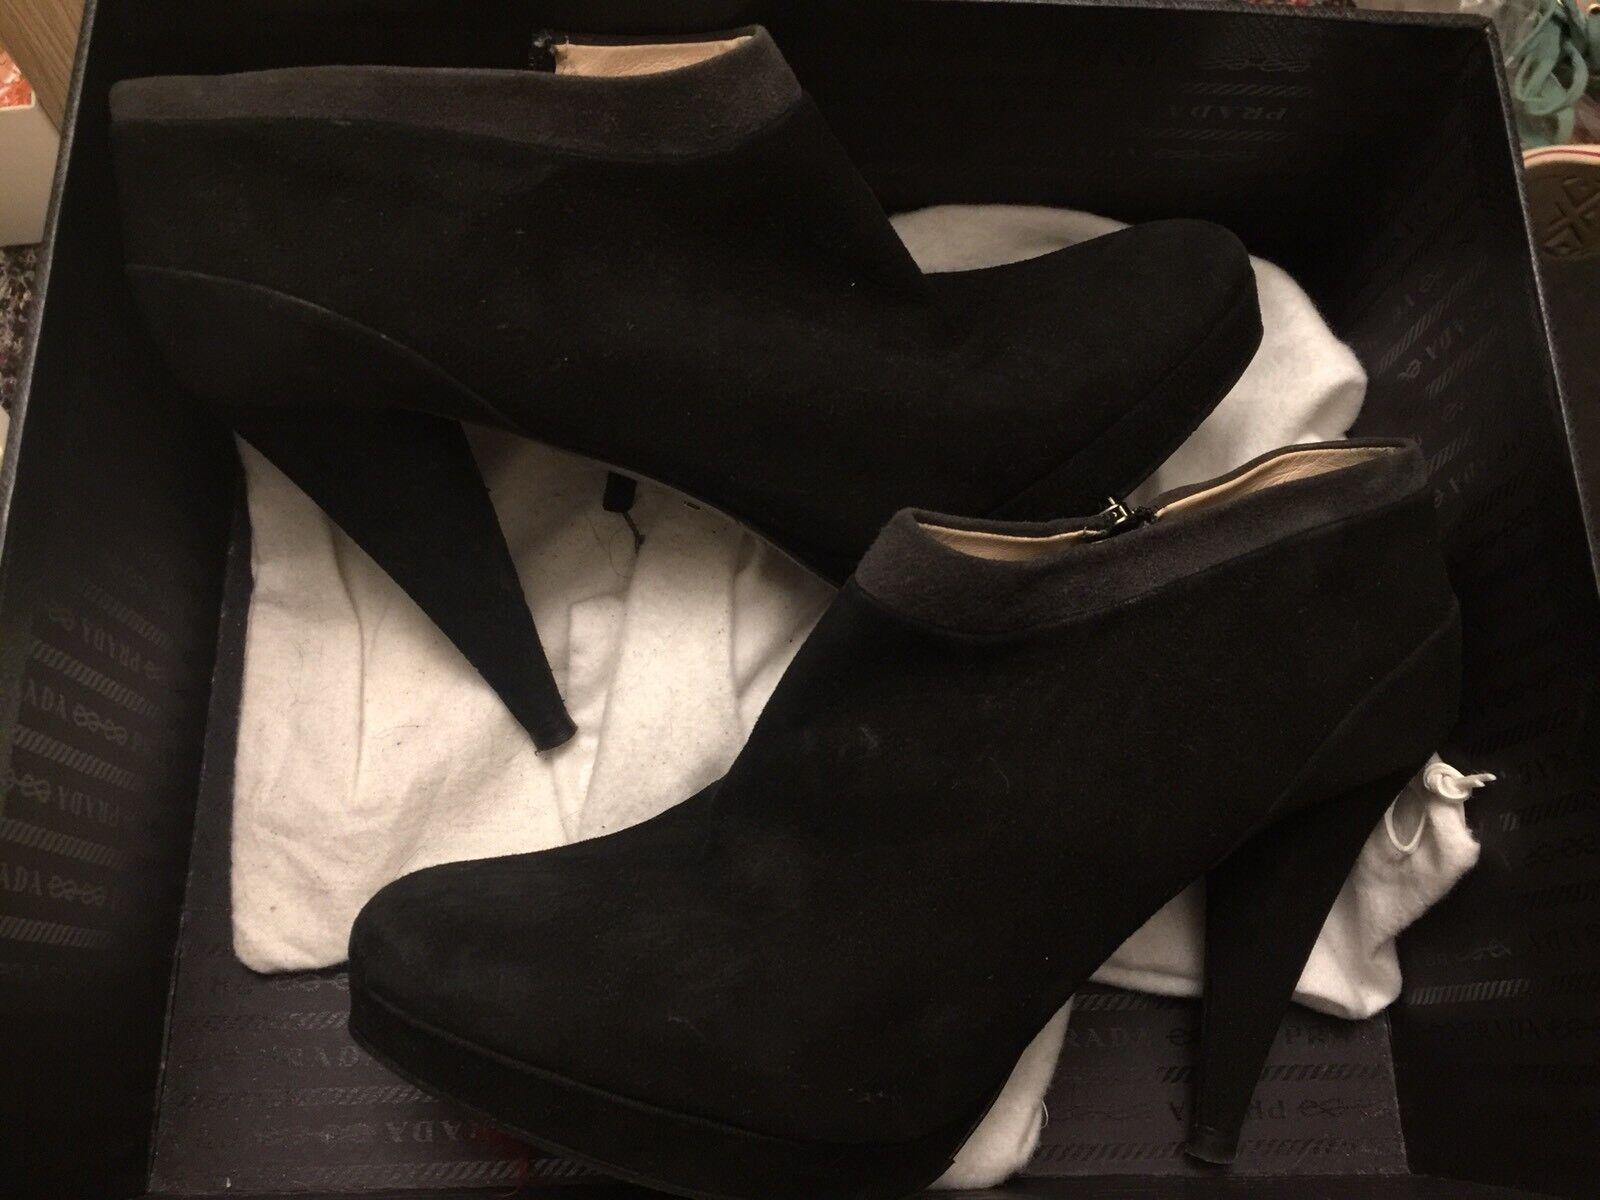 Prada Mujer Botas al Tobillo Size EU38.5 Negro Gamuza